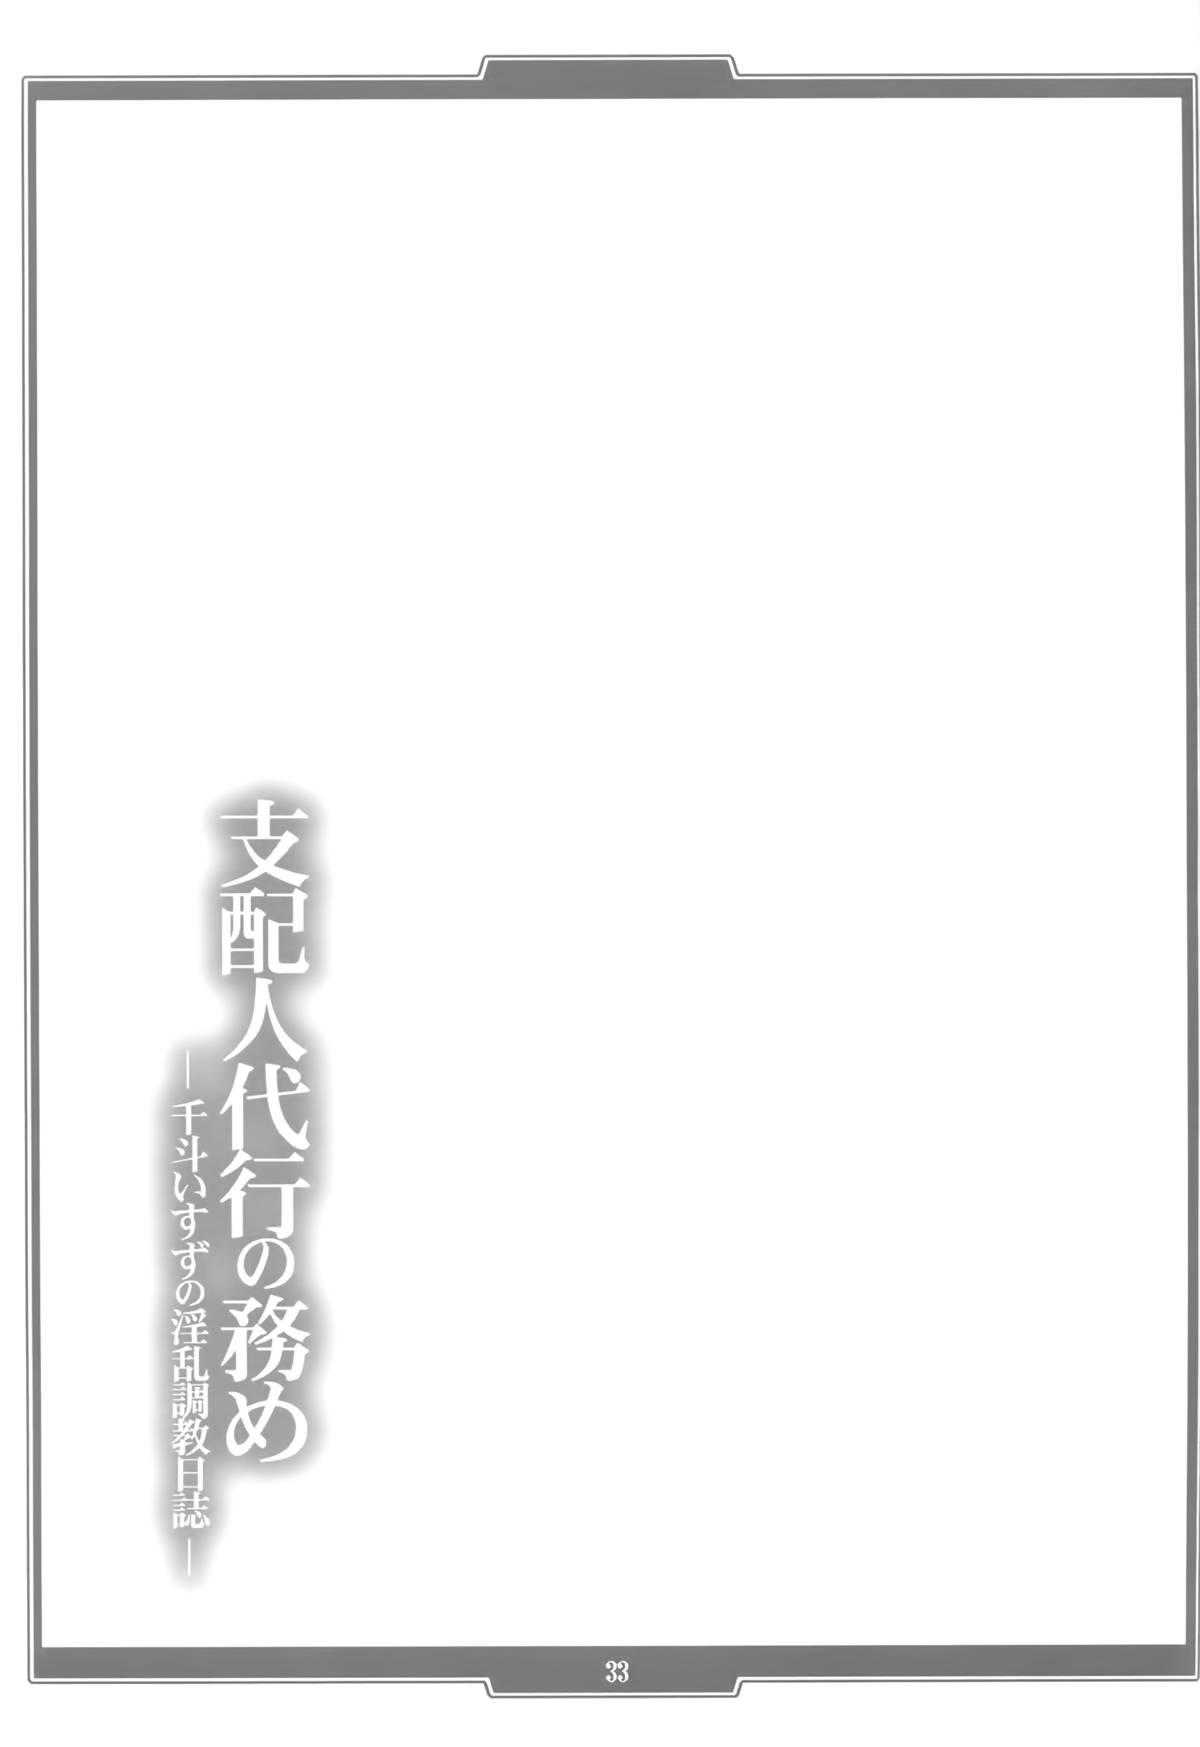 (C87) [H.B (B-RIVER)] Shihainin Daikou no Tsutome -Sento Isuzu no Inran Choukyou Nisshi- | Acting Manager's Duty -Sento Isuzu's Lewd Training Diary- (Amagi Brilliant Park) [English] [doujin-moe.us] 31